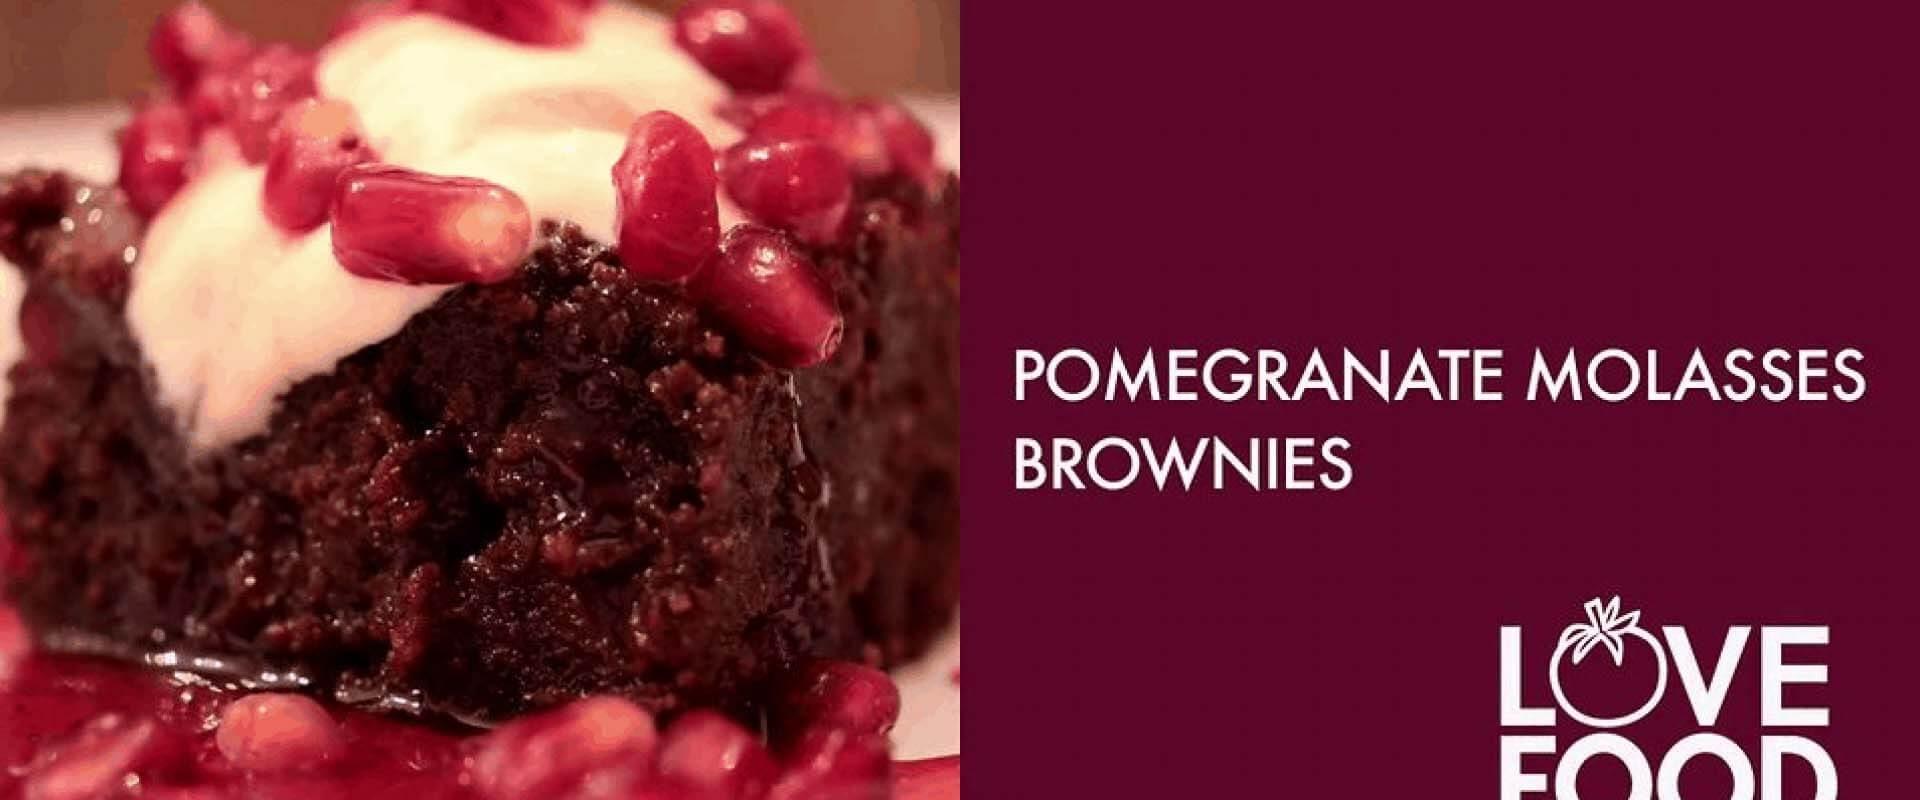 Pomegranate Molasses Brownies